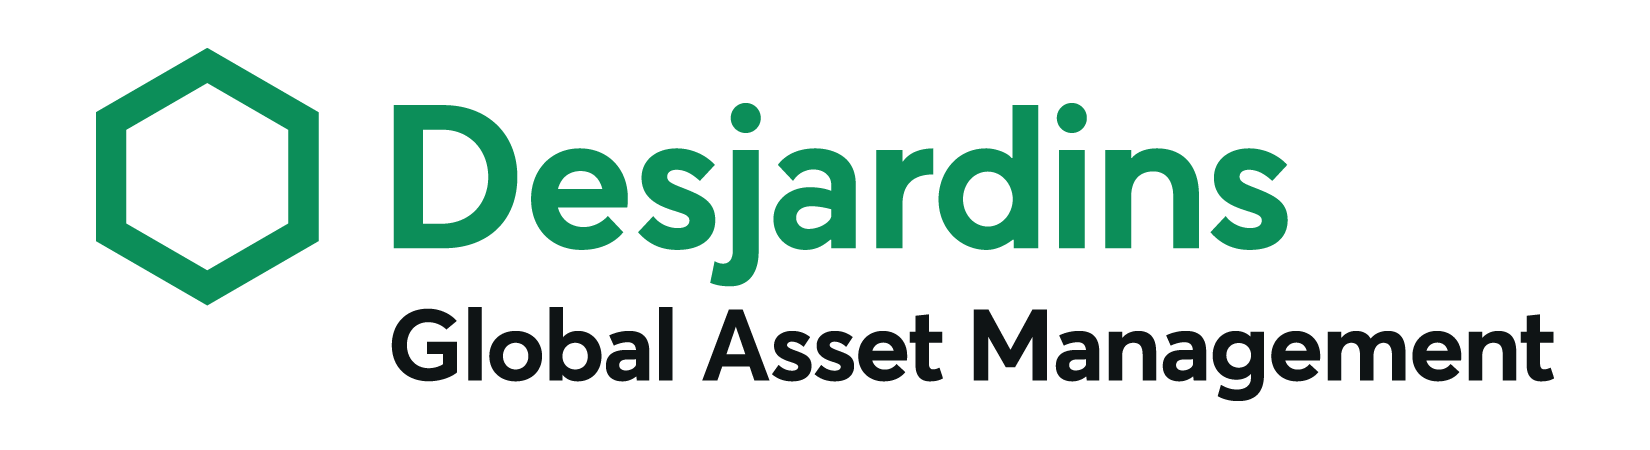 Desjardins Global Asset Management